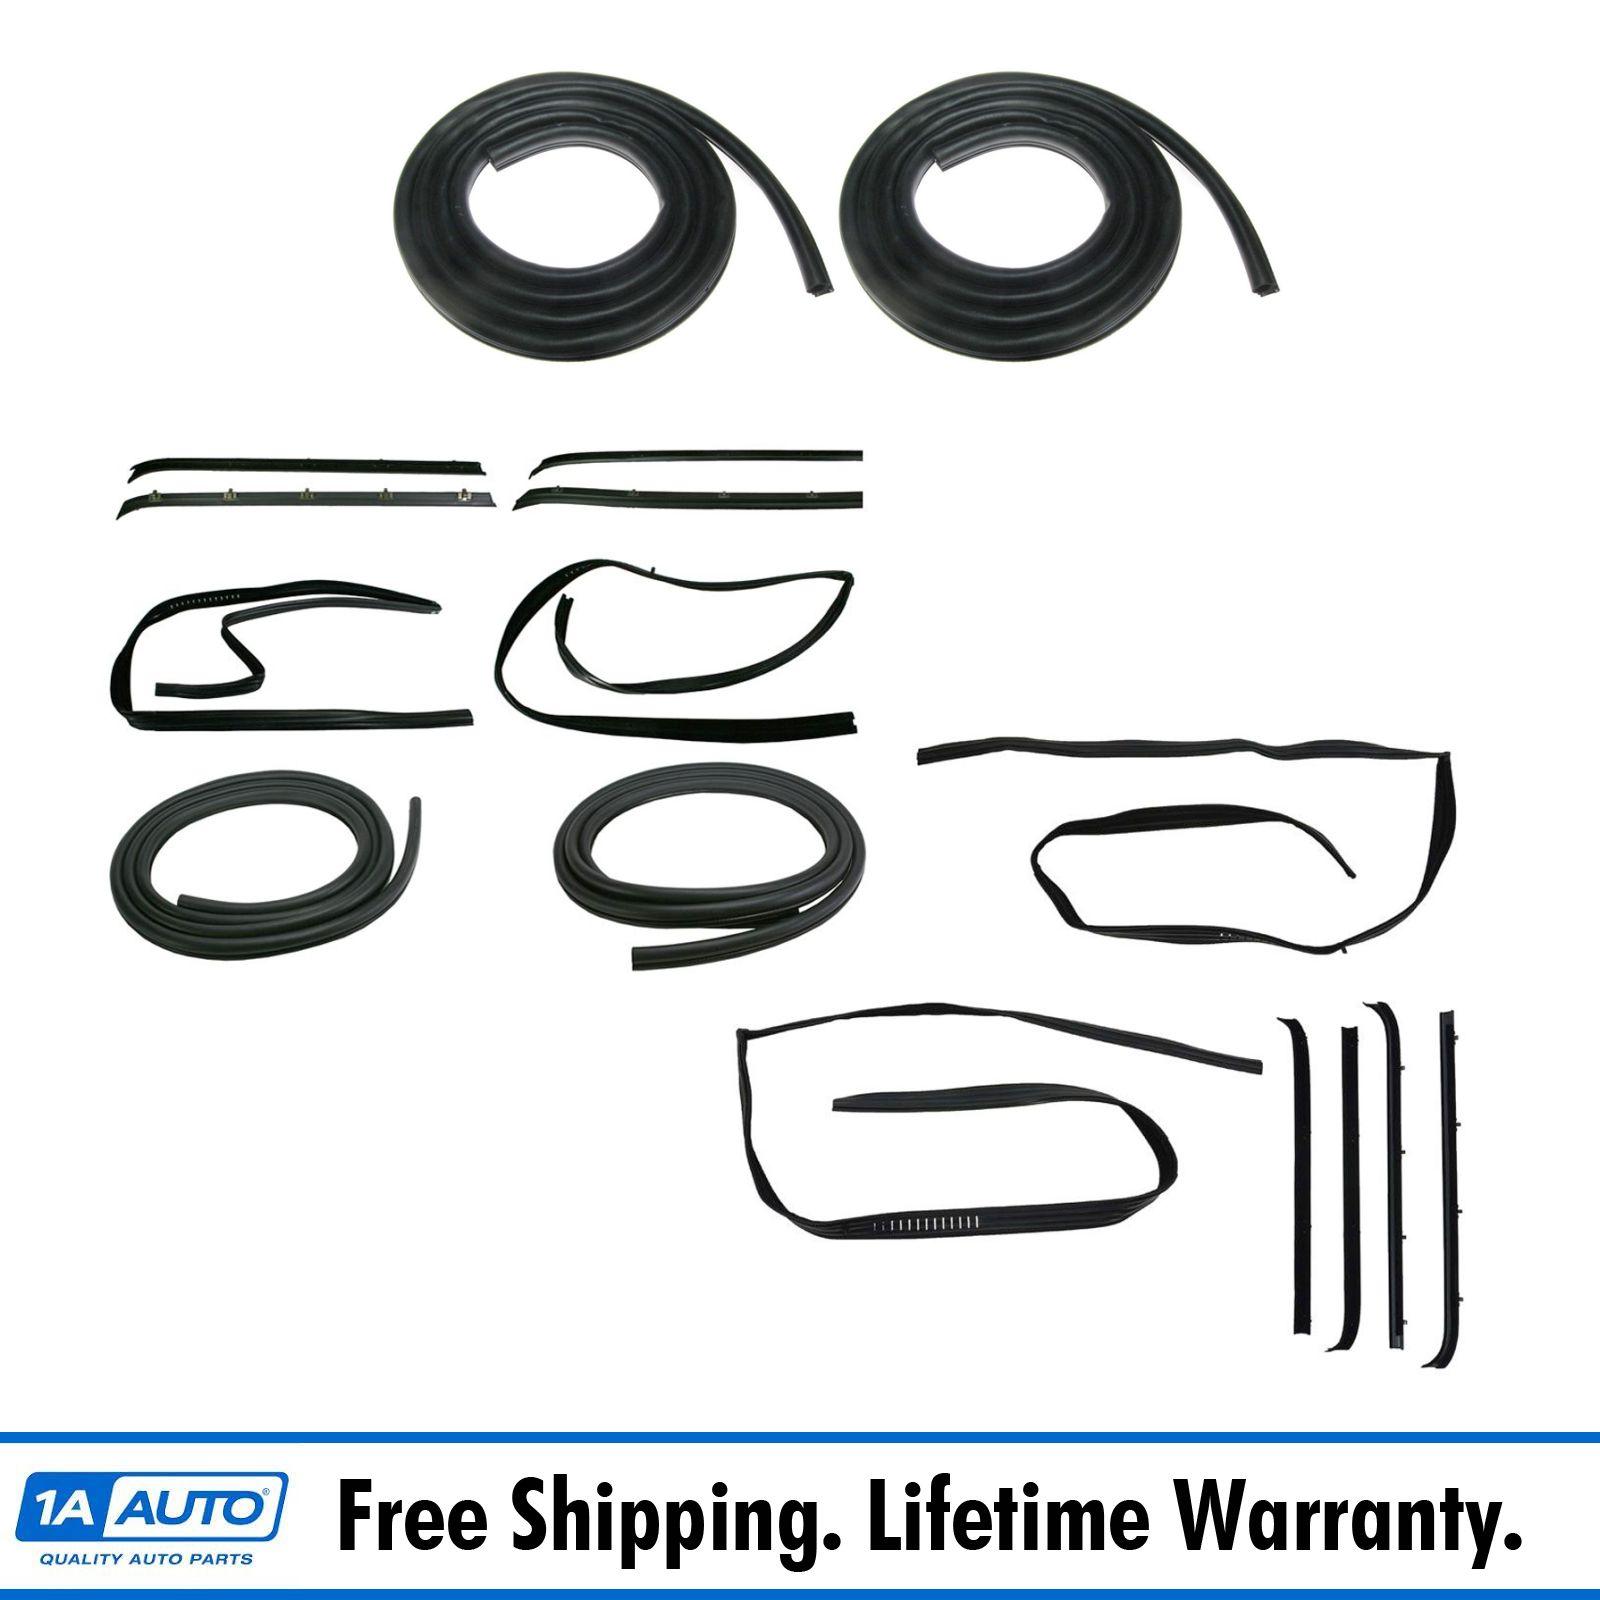 Rear Door Weather Strip Seal 8 Piece Kit Set for Chevrolet GMC Pickup Truck SUV